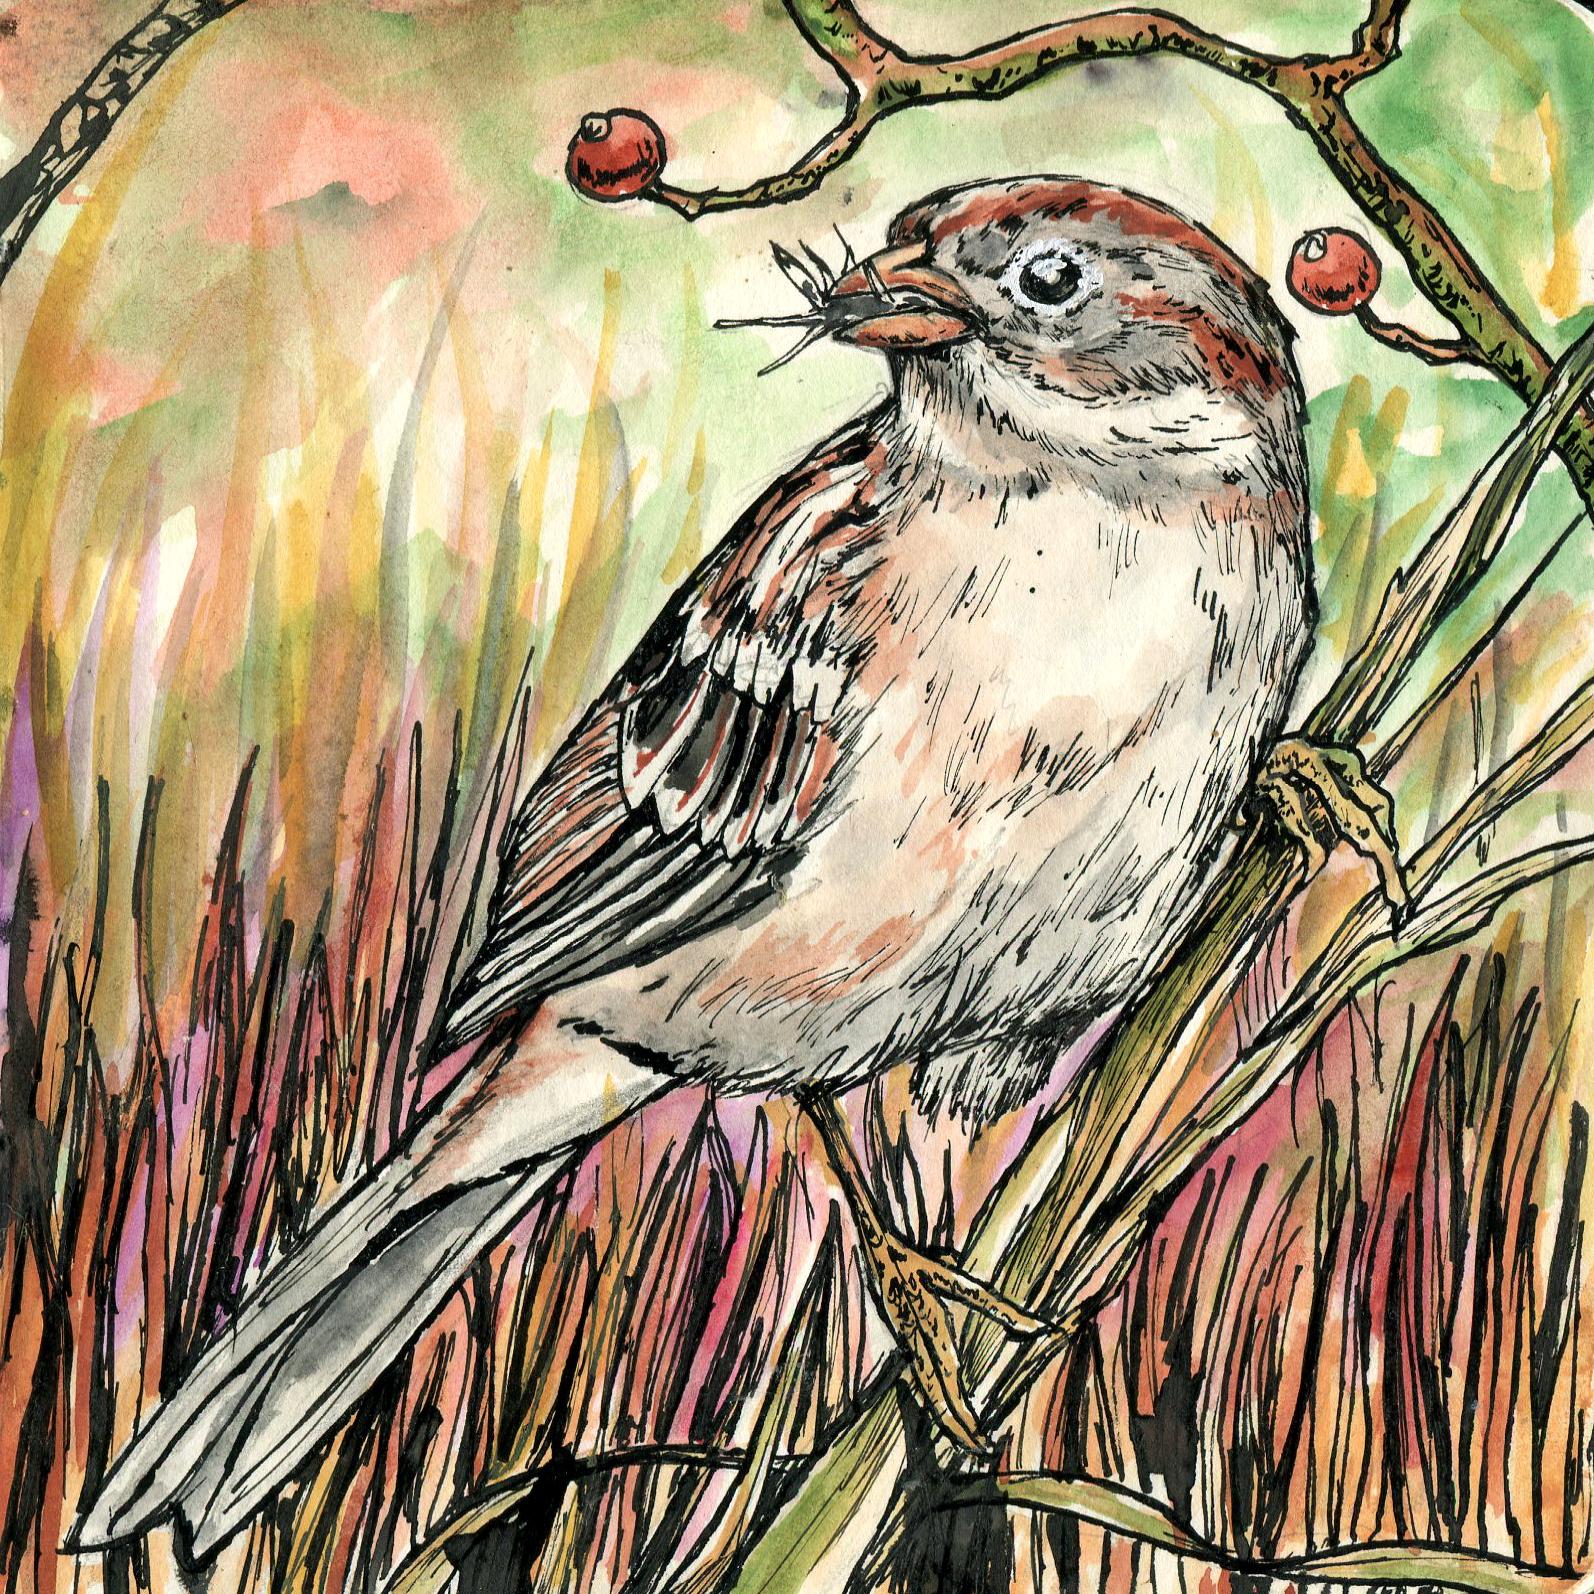 136. Field Sparrow